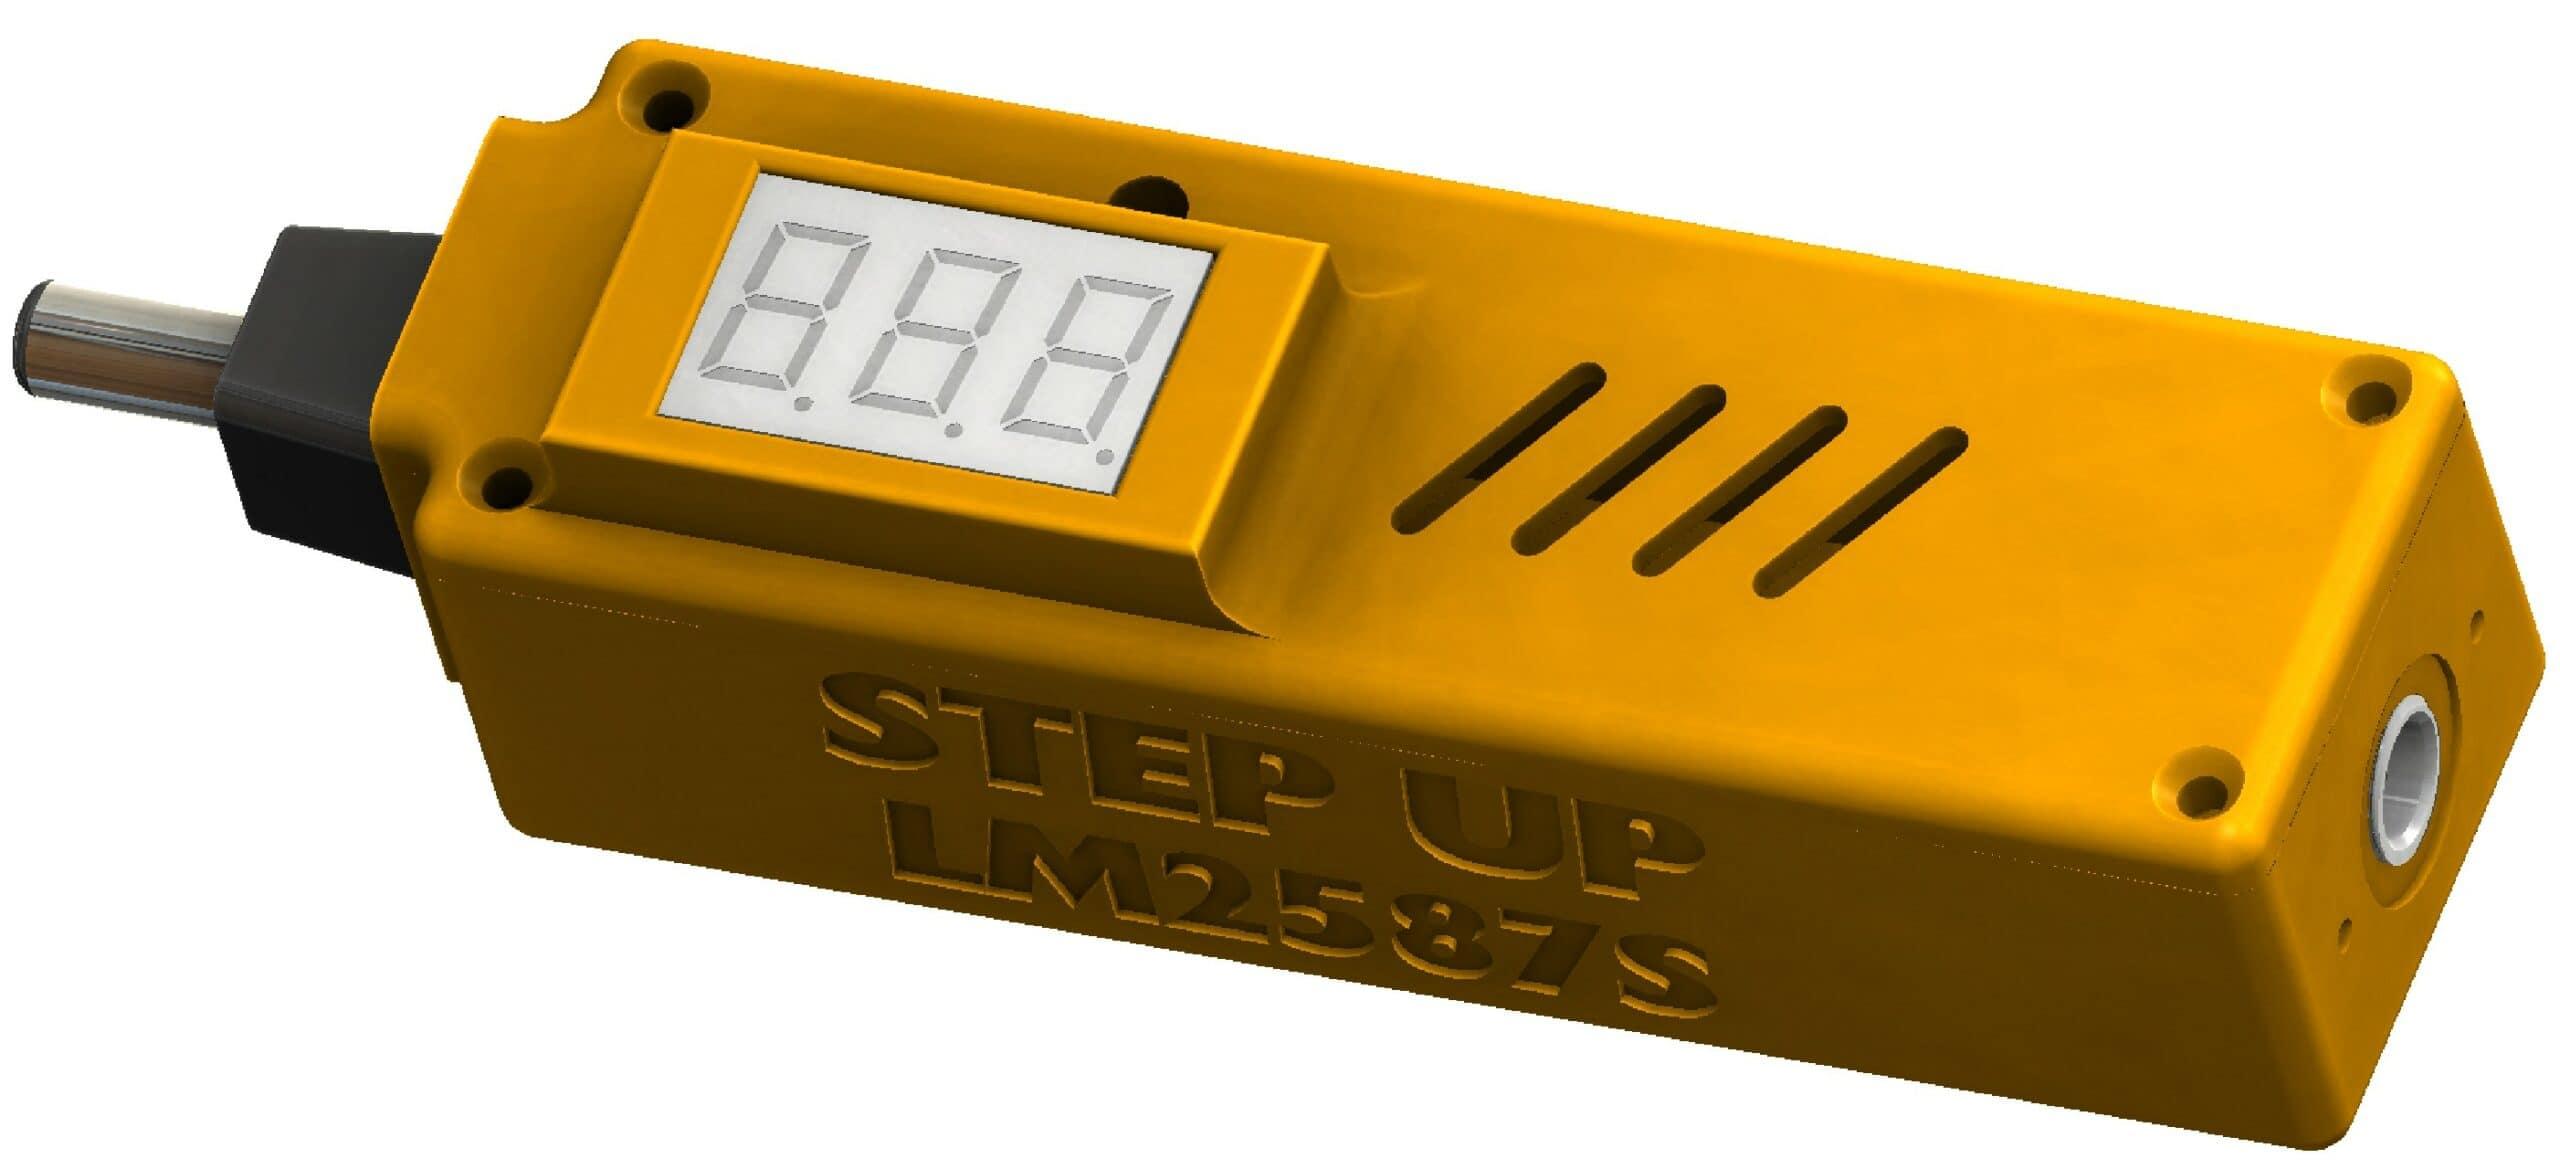 LM2587S Spannungswandler CAD LM2587S voltage converter